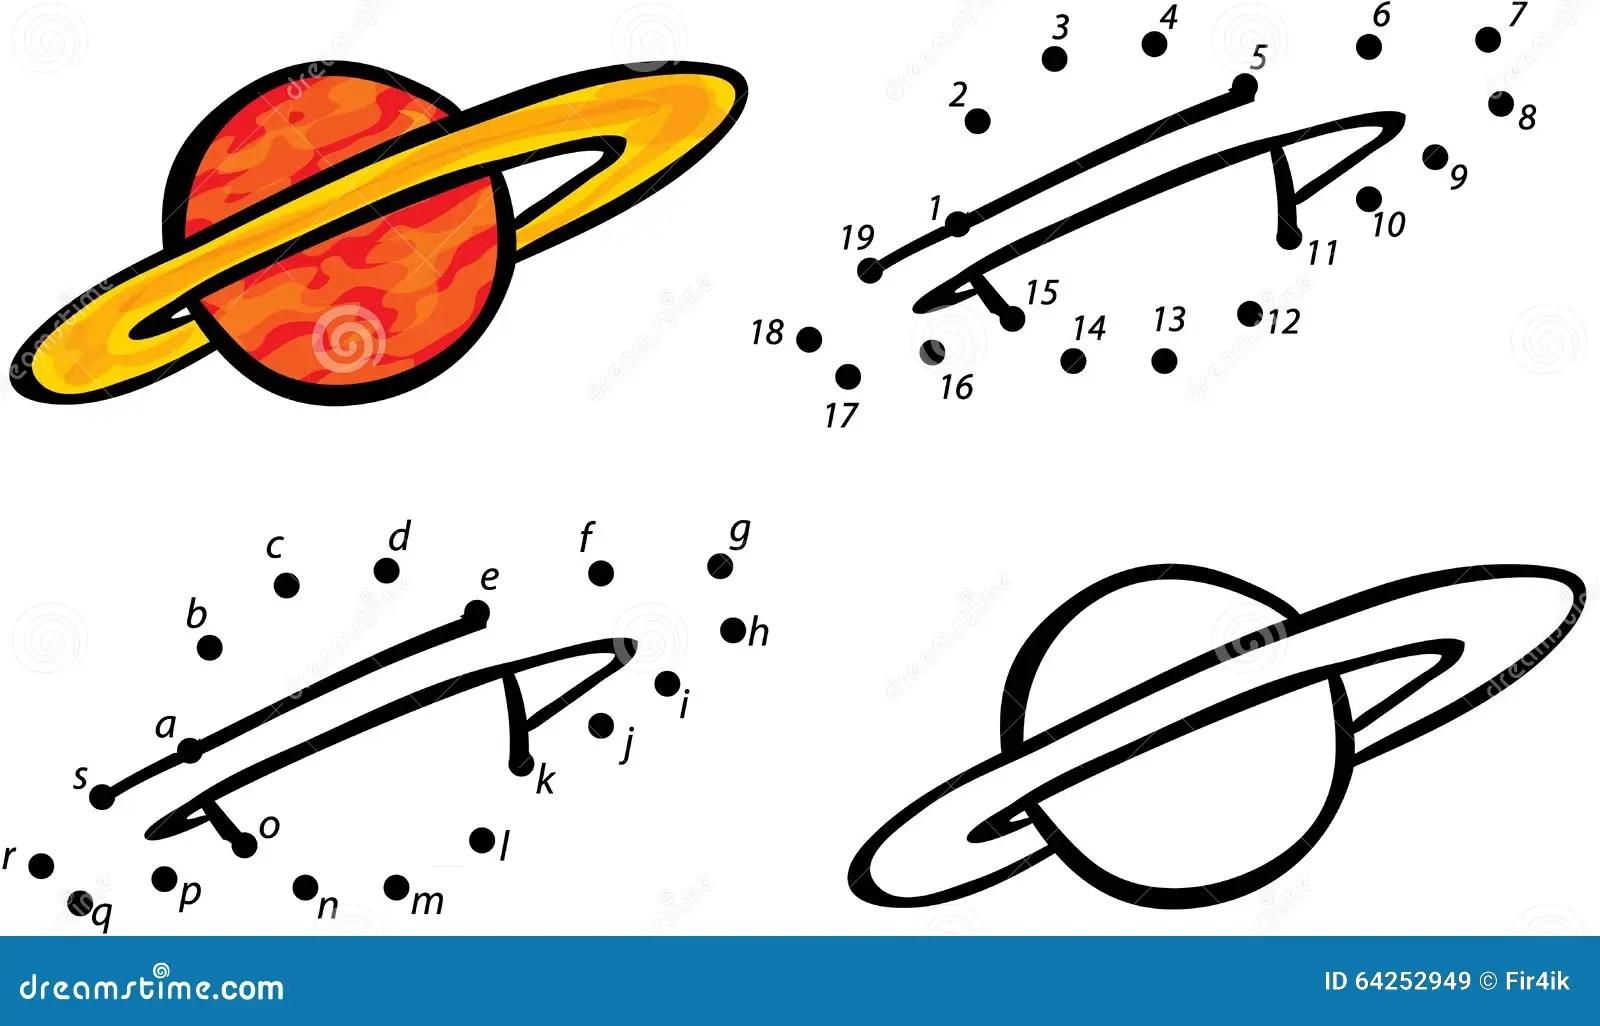 Cartoon Planet Jupiter Vector Illustration Coloring And